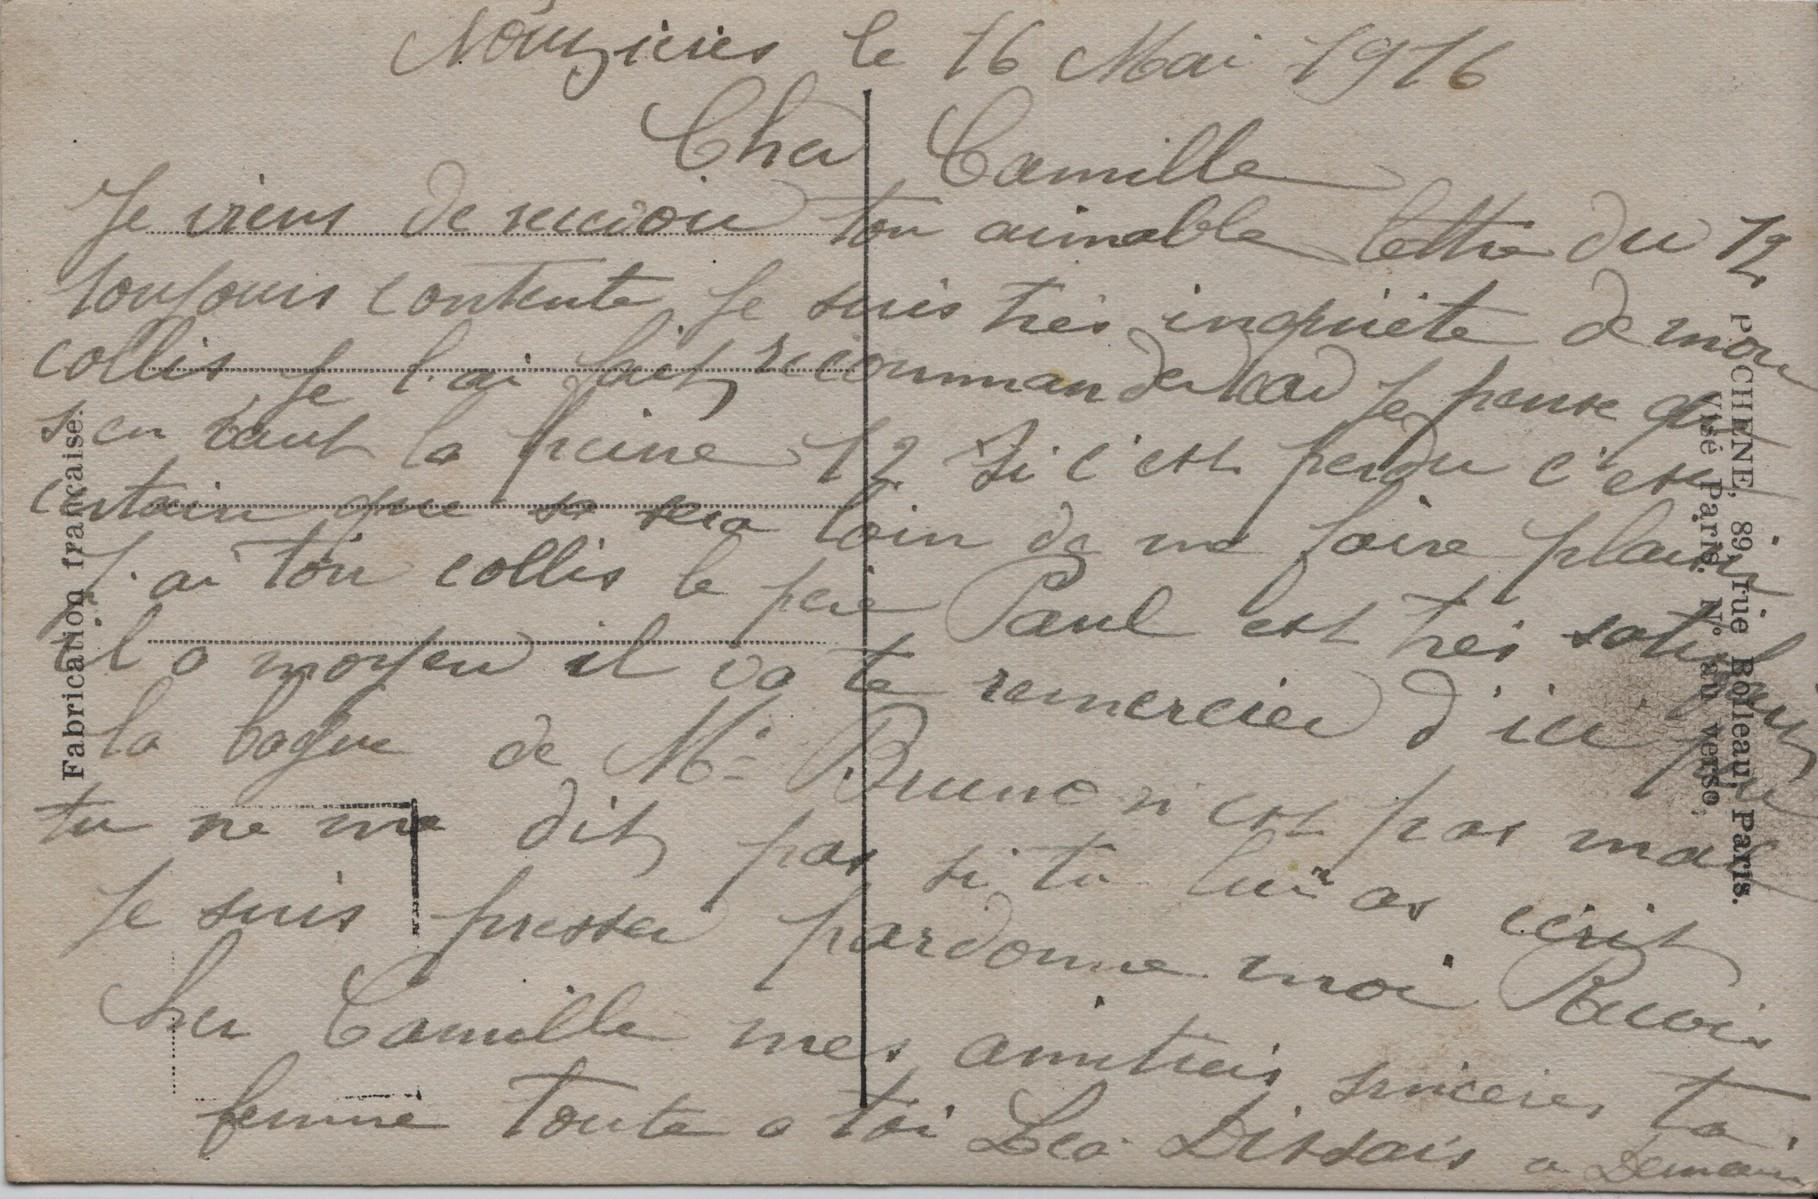 4. Nouzières 16 May 1916